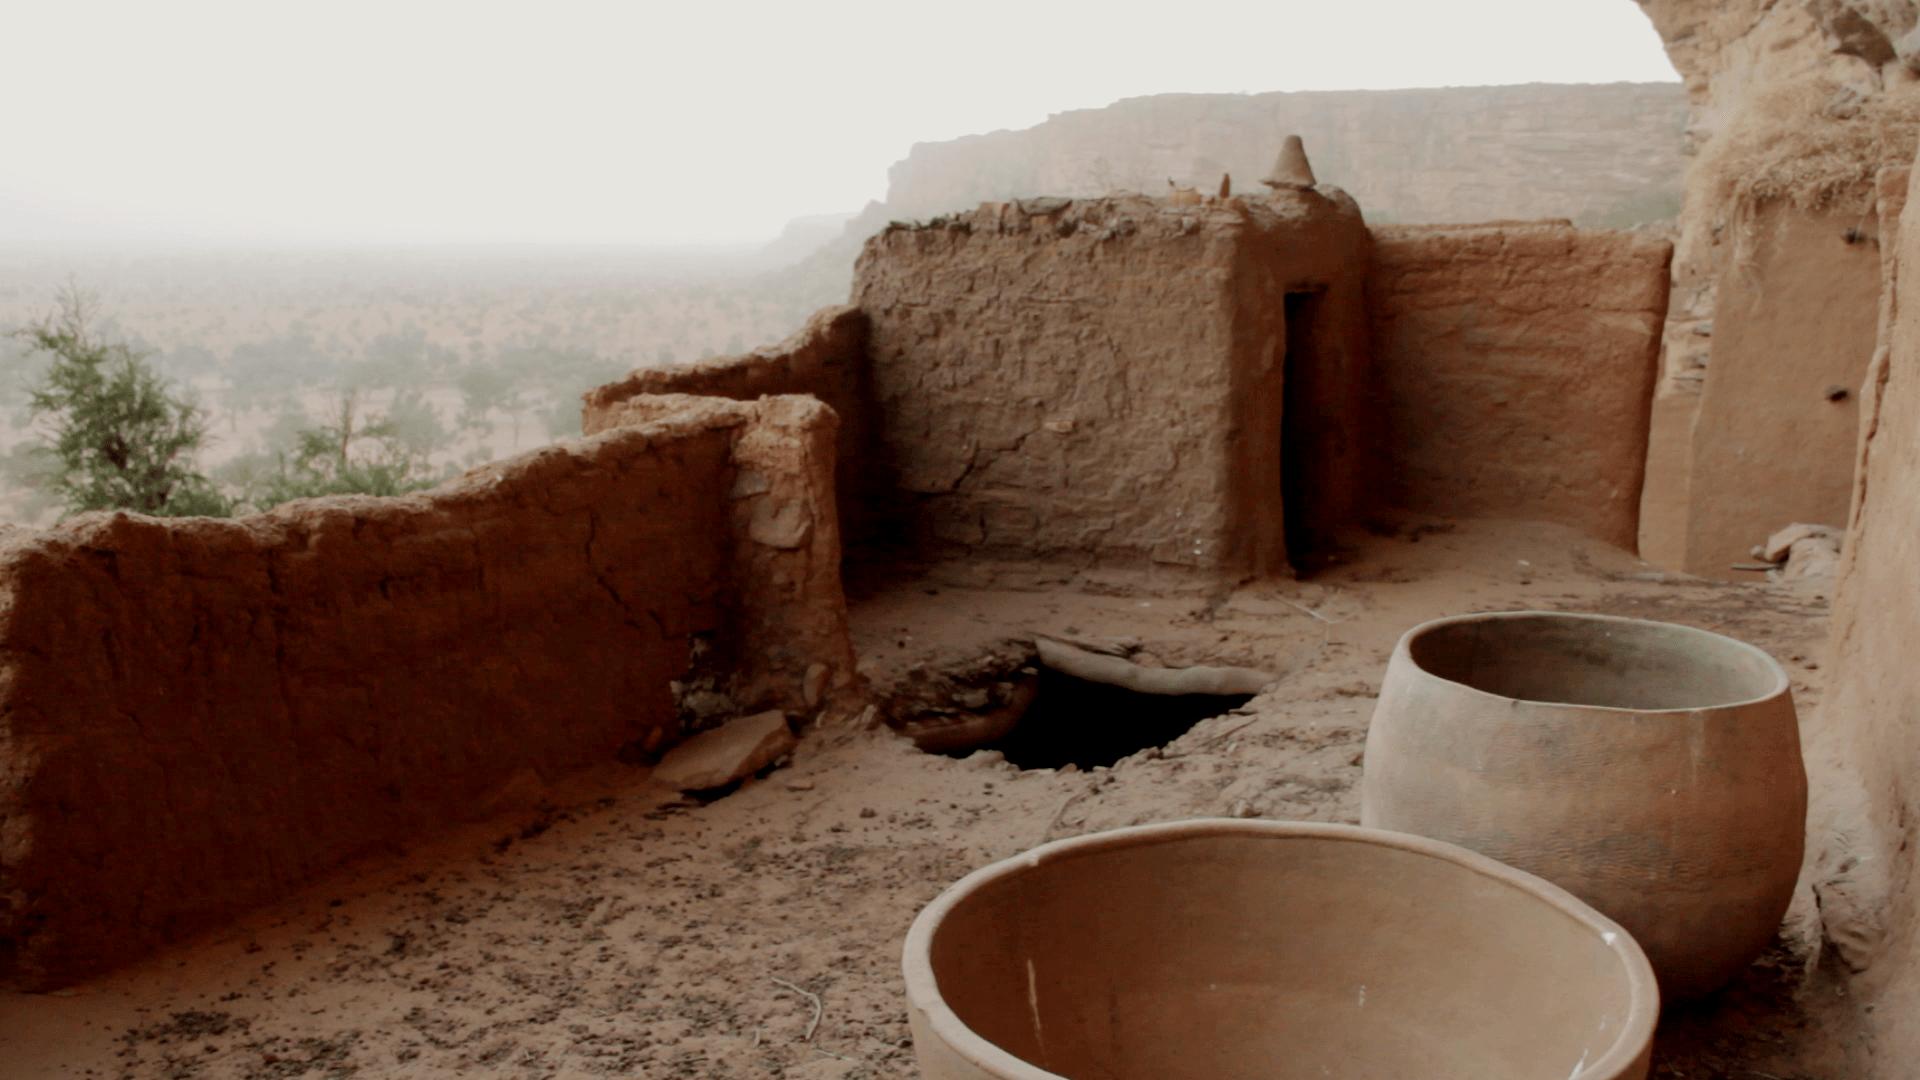 casa tellem mali pablocaminante - Malí 7, País Dogon IV: Tellem